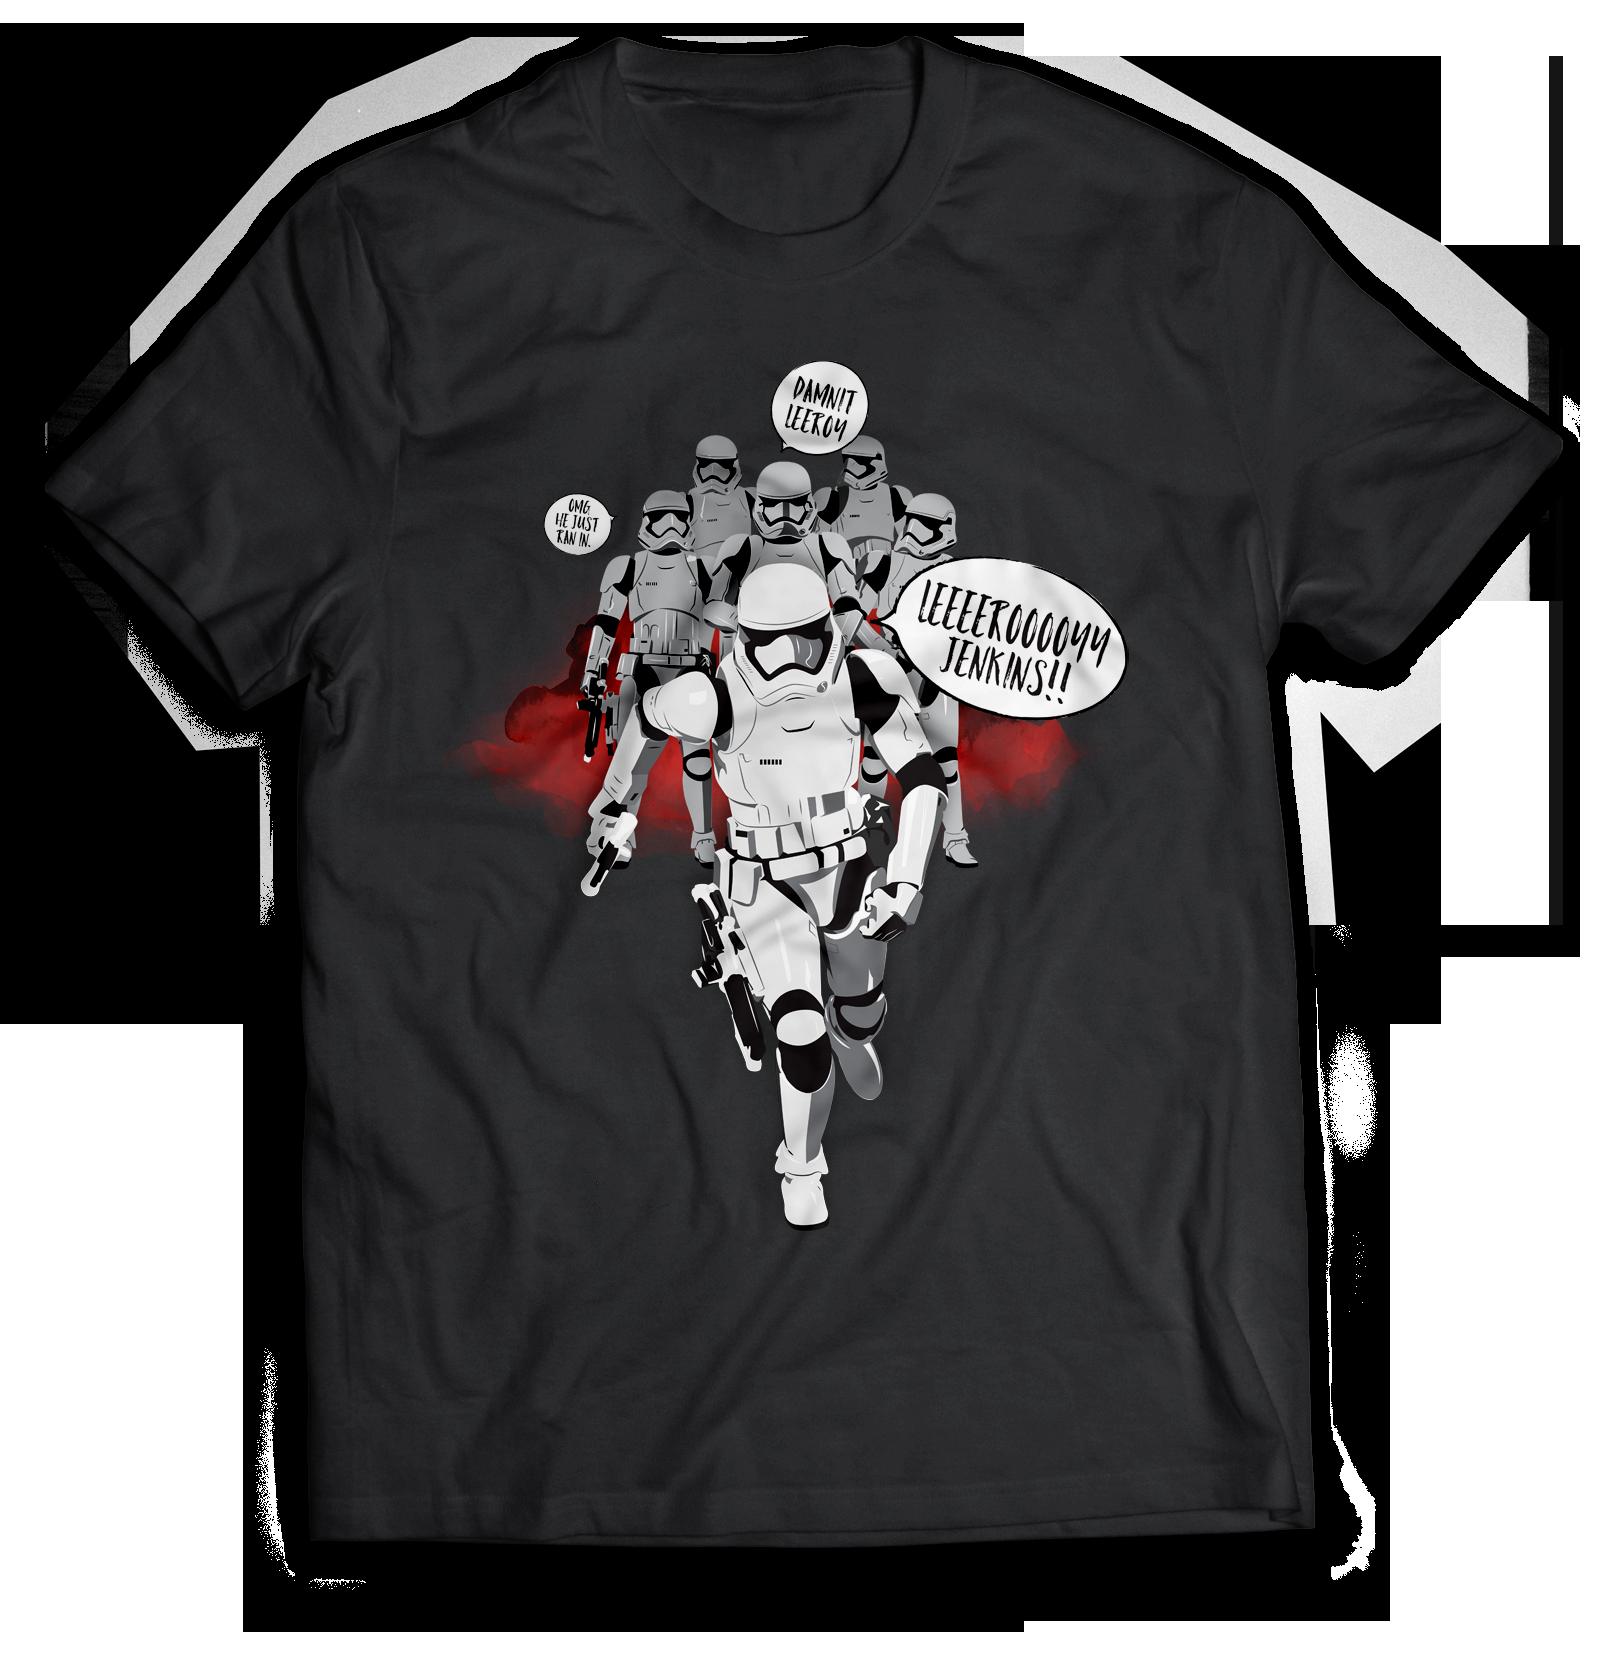 Stormtrooper Jenkins Star Wars world of warcraft T-Shirt Jlane Design Teepublic